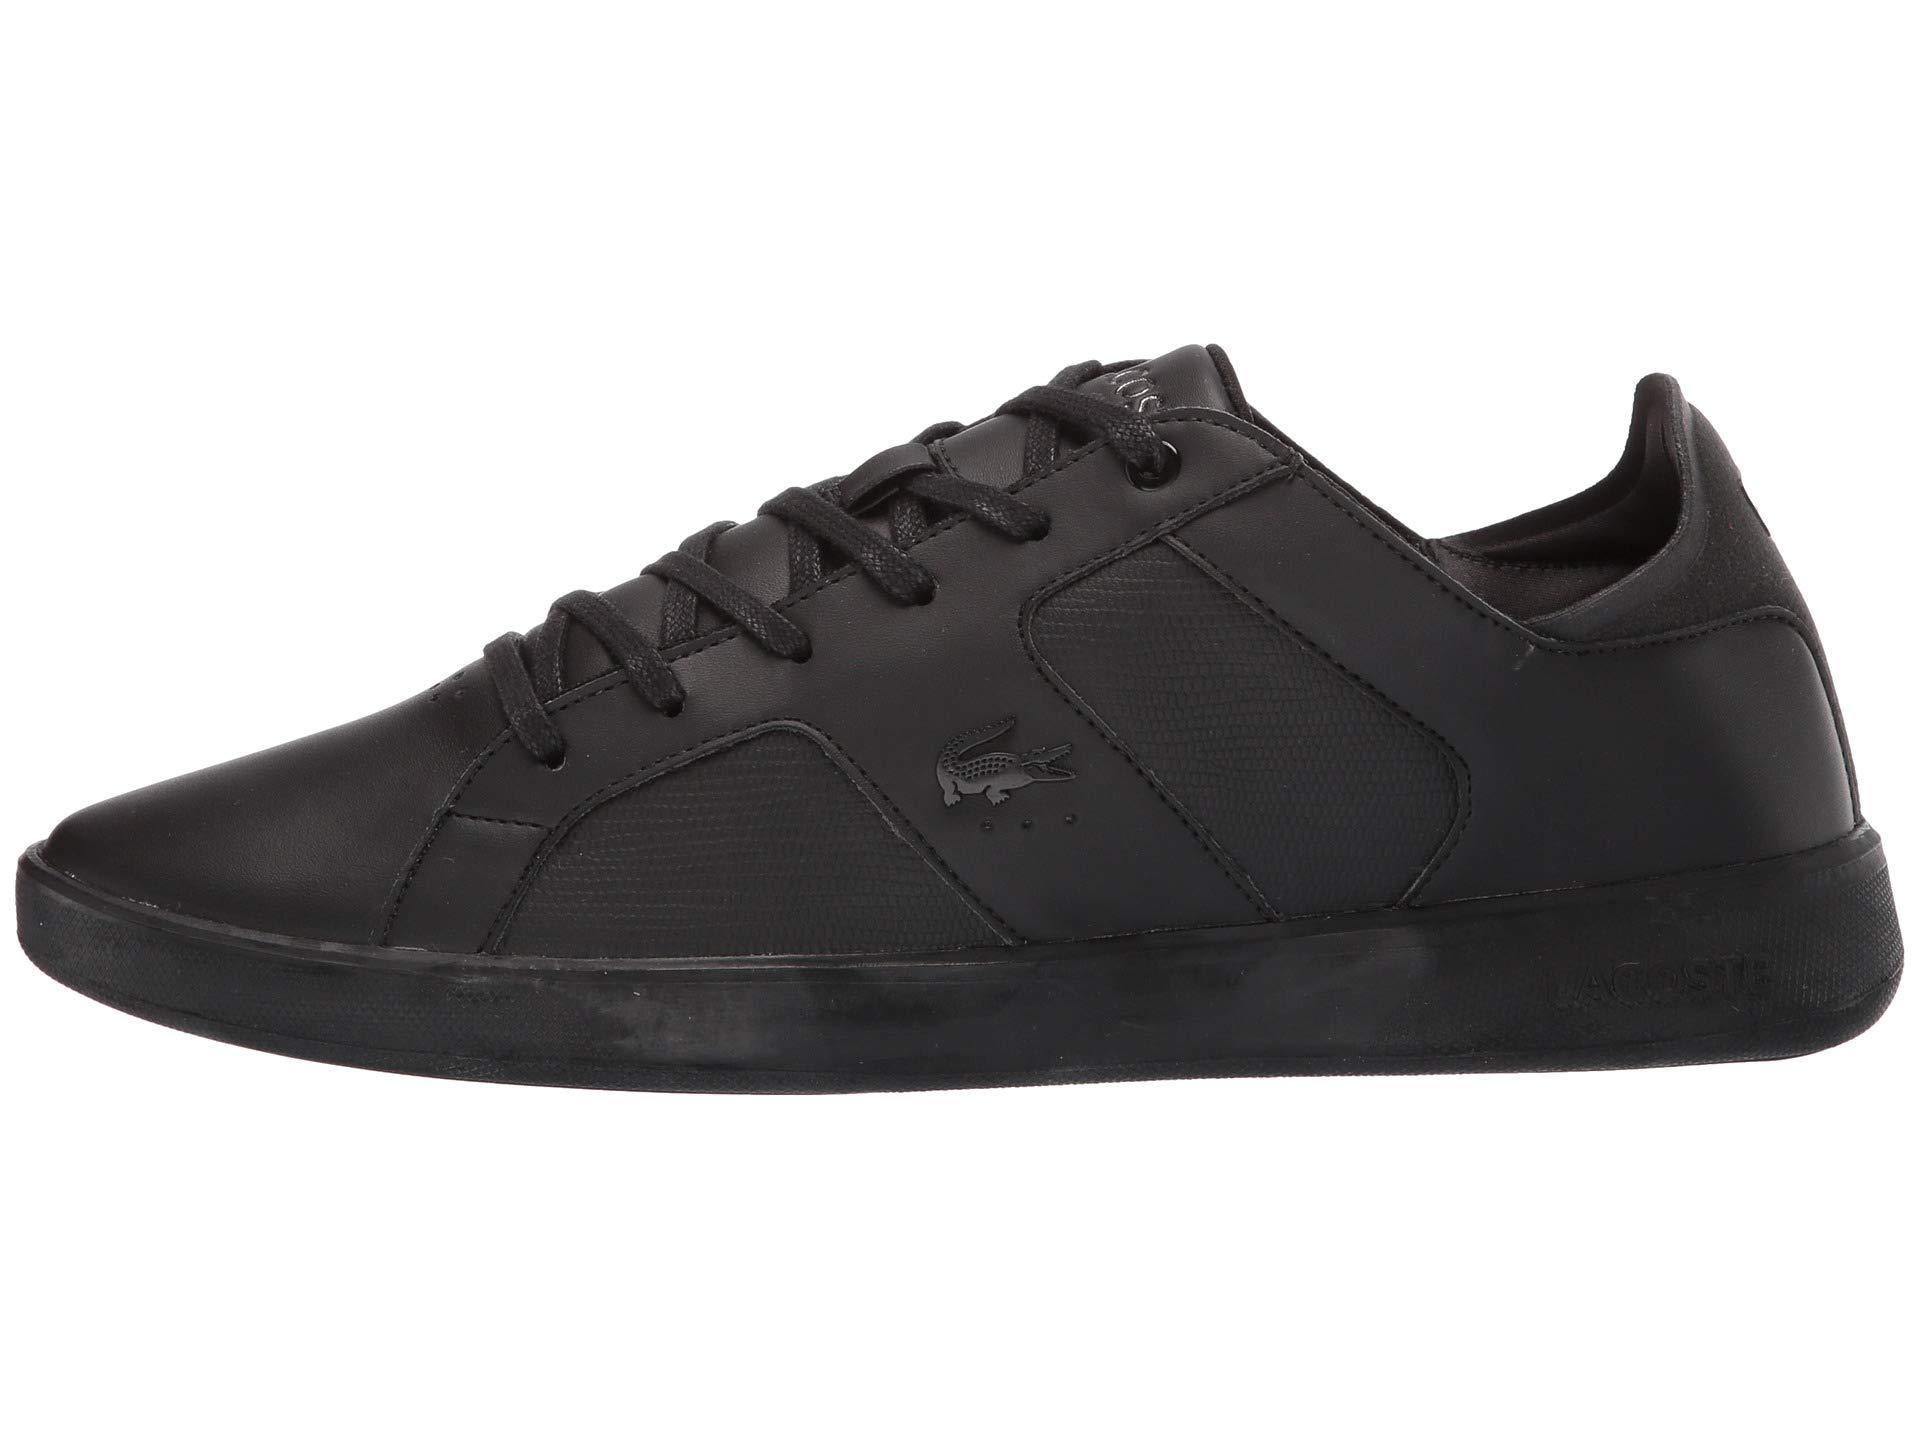 black Black 4 Lacoste Novas 119 wIqBTC